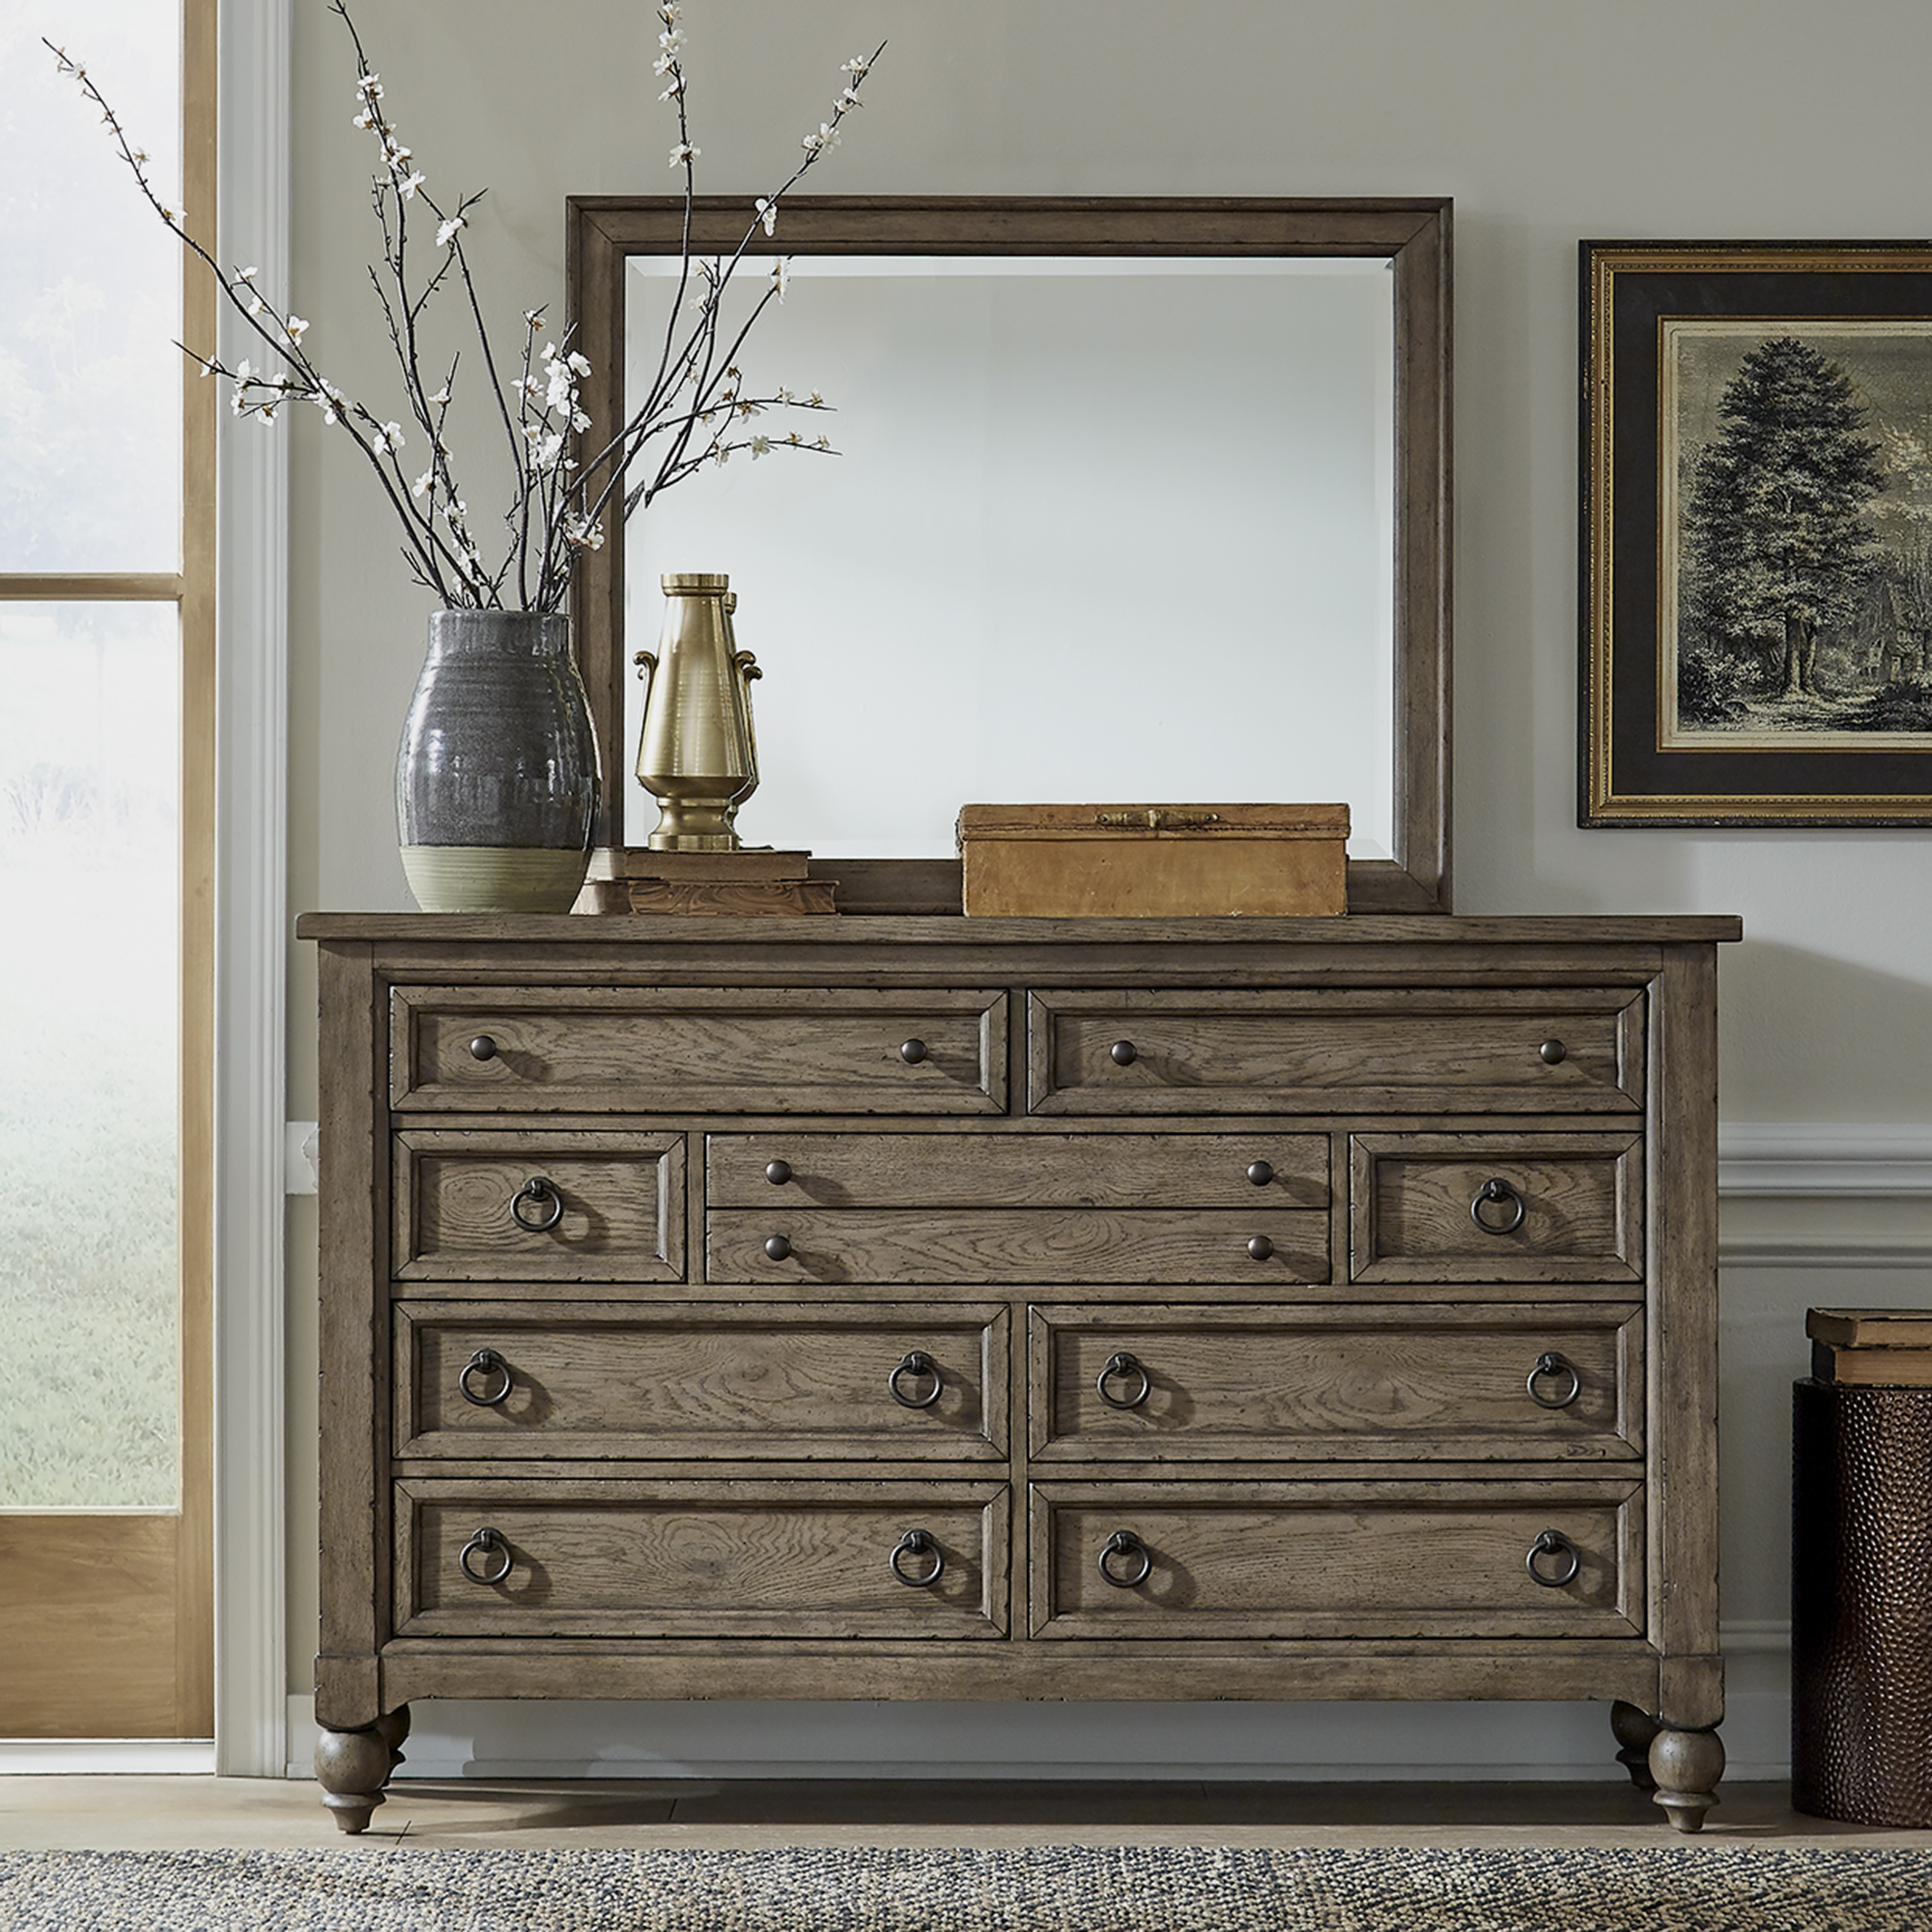 Americana Farmhouse Dresser & Mirror Set by Libby at Walker's Furniture